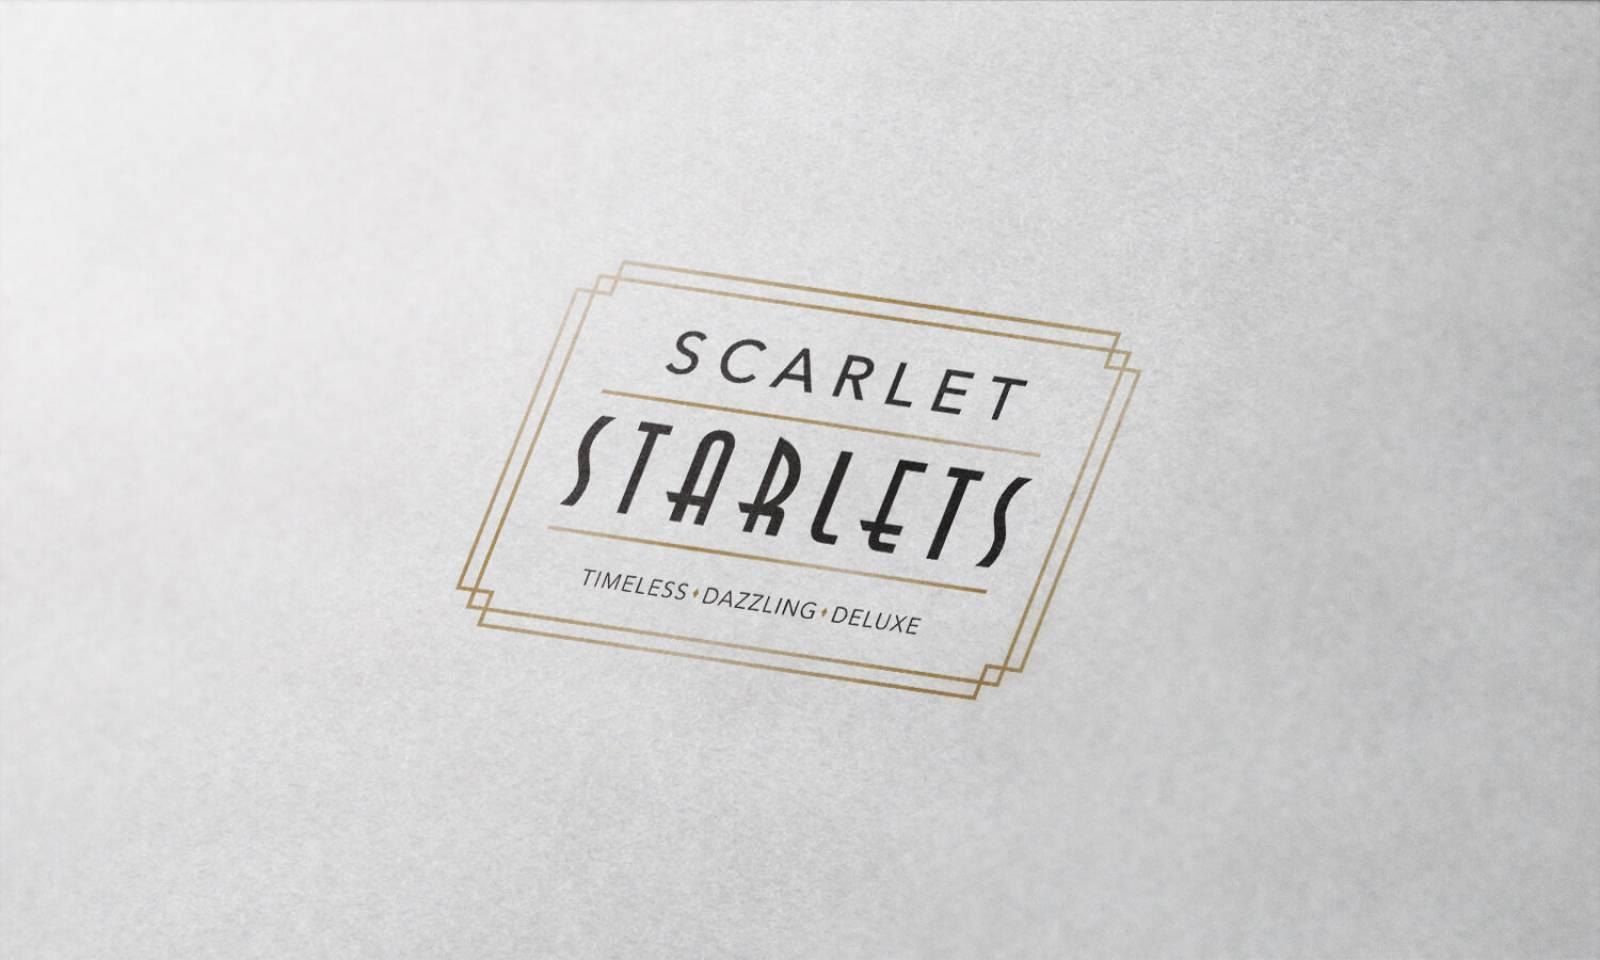 Scarlet-starlets-2-logo-corporate-identity-agency-graphic-design-canterbury.jpg